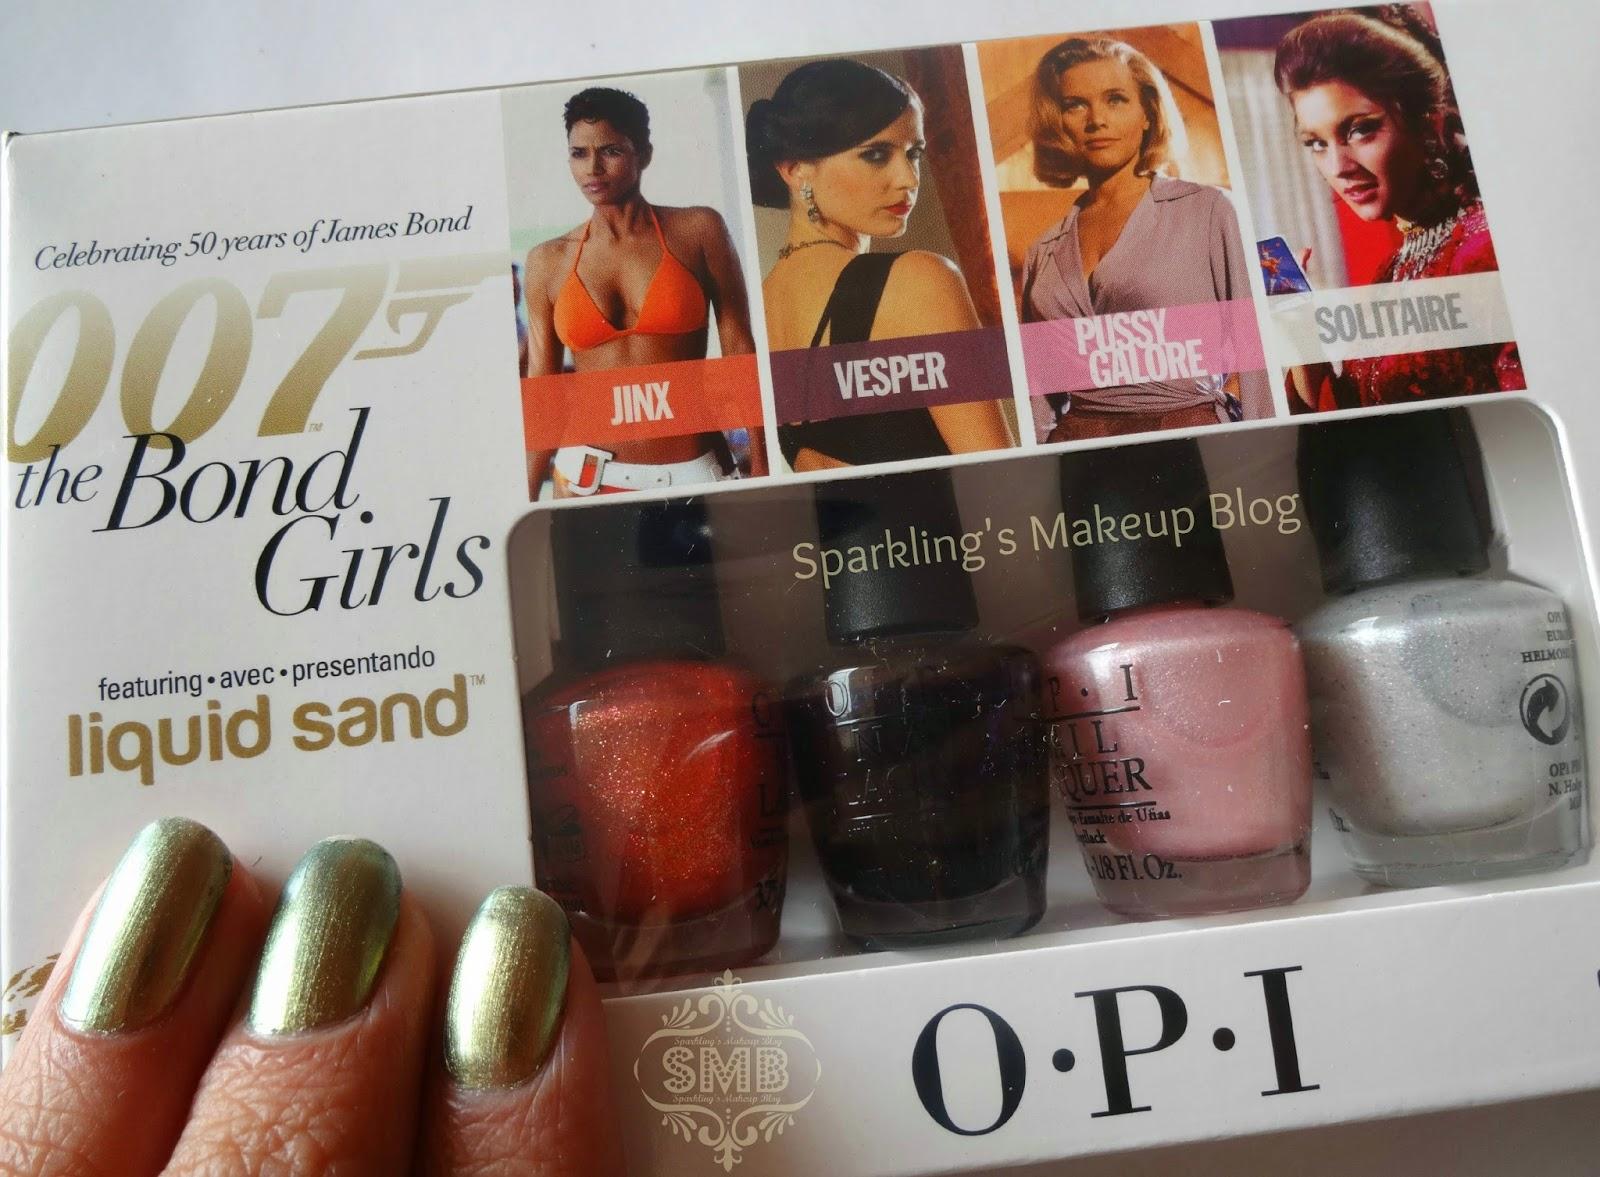 O.P.I 007 the Bond Girls Liquid Sand mini collection~ Review ...